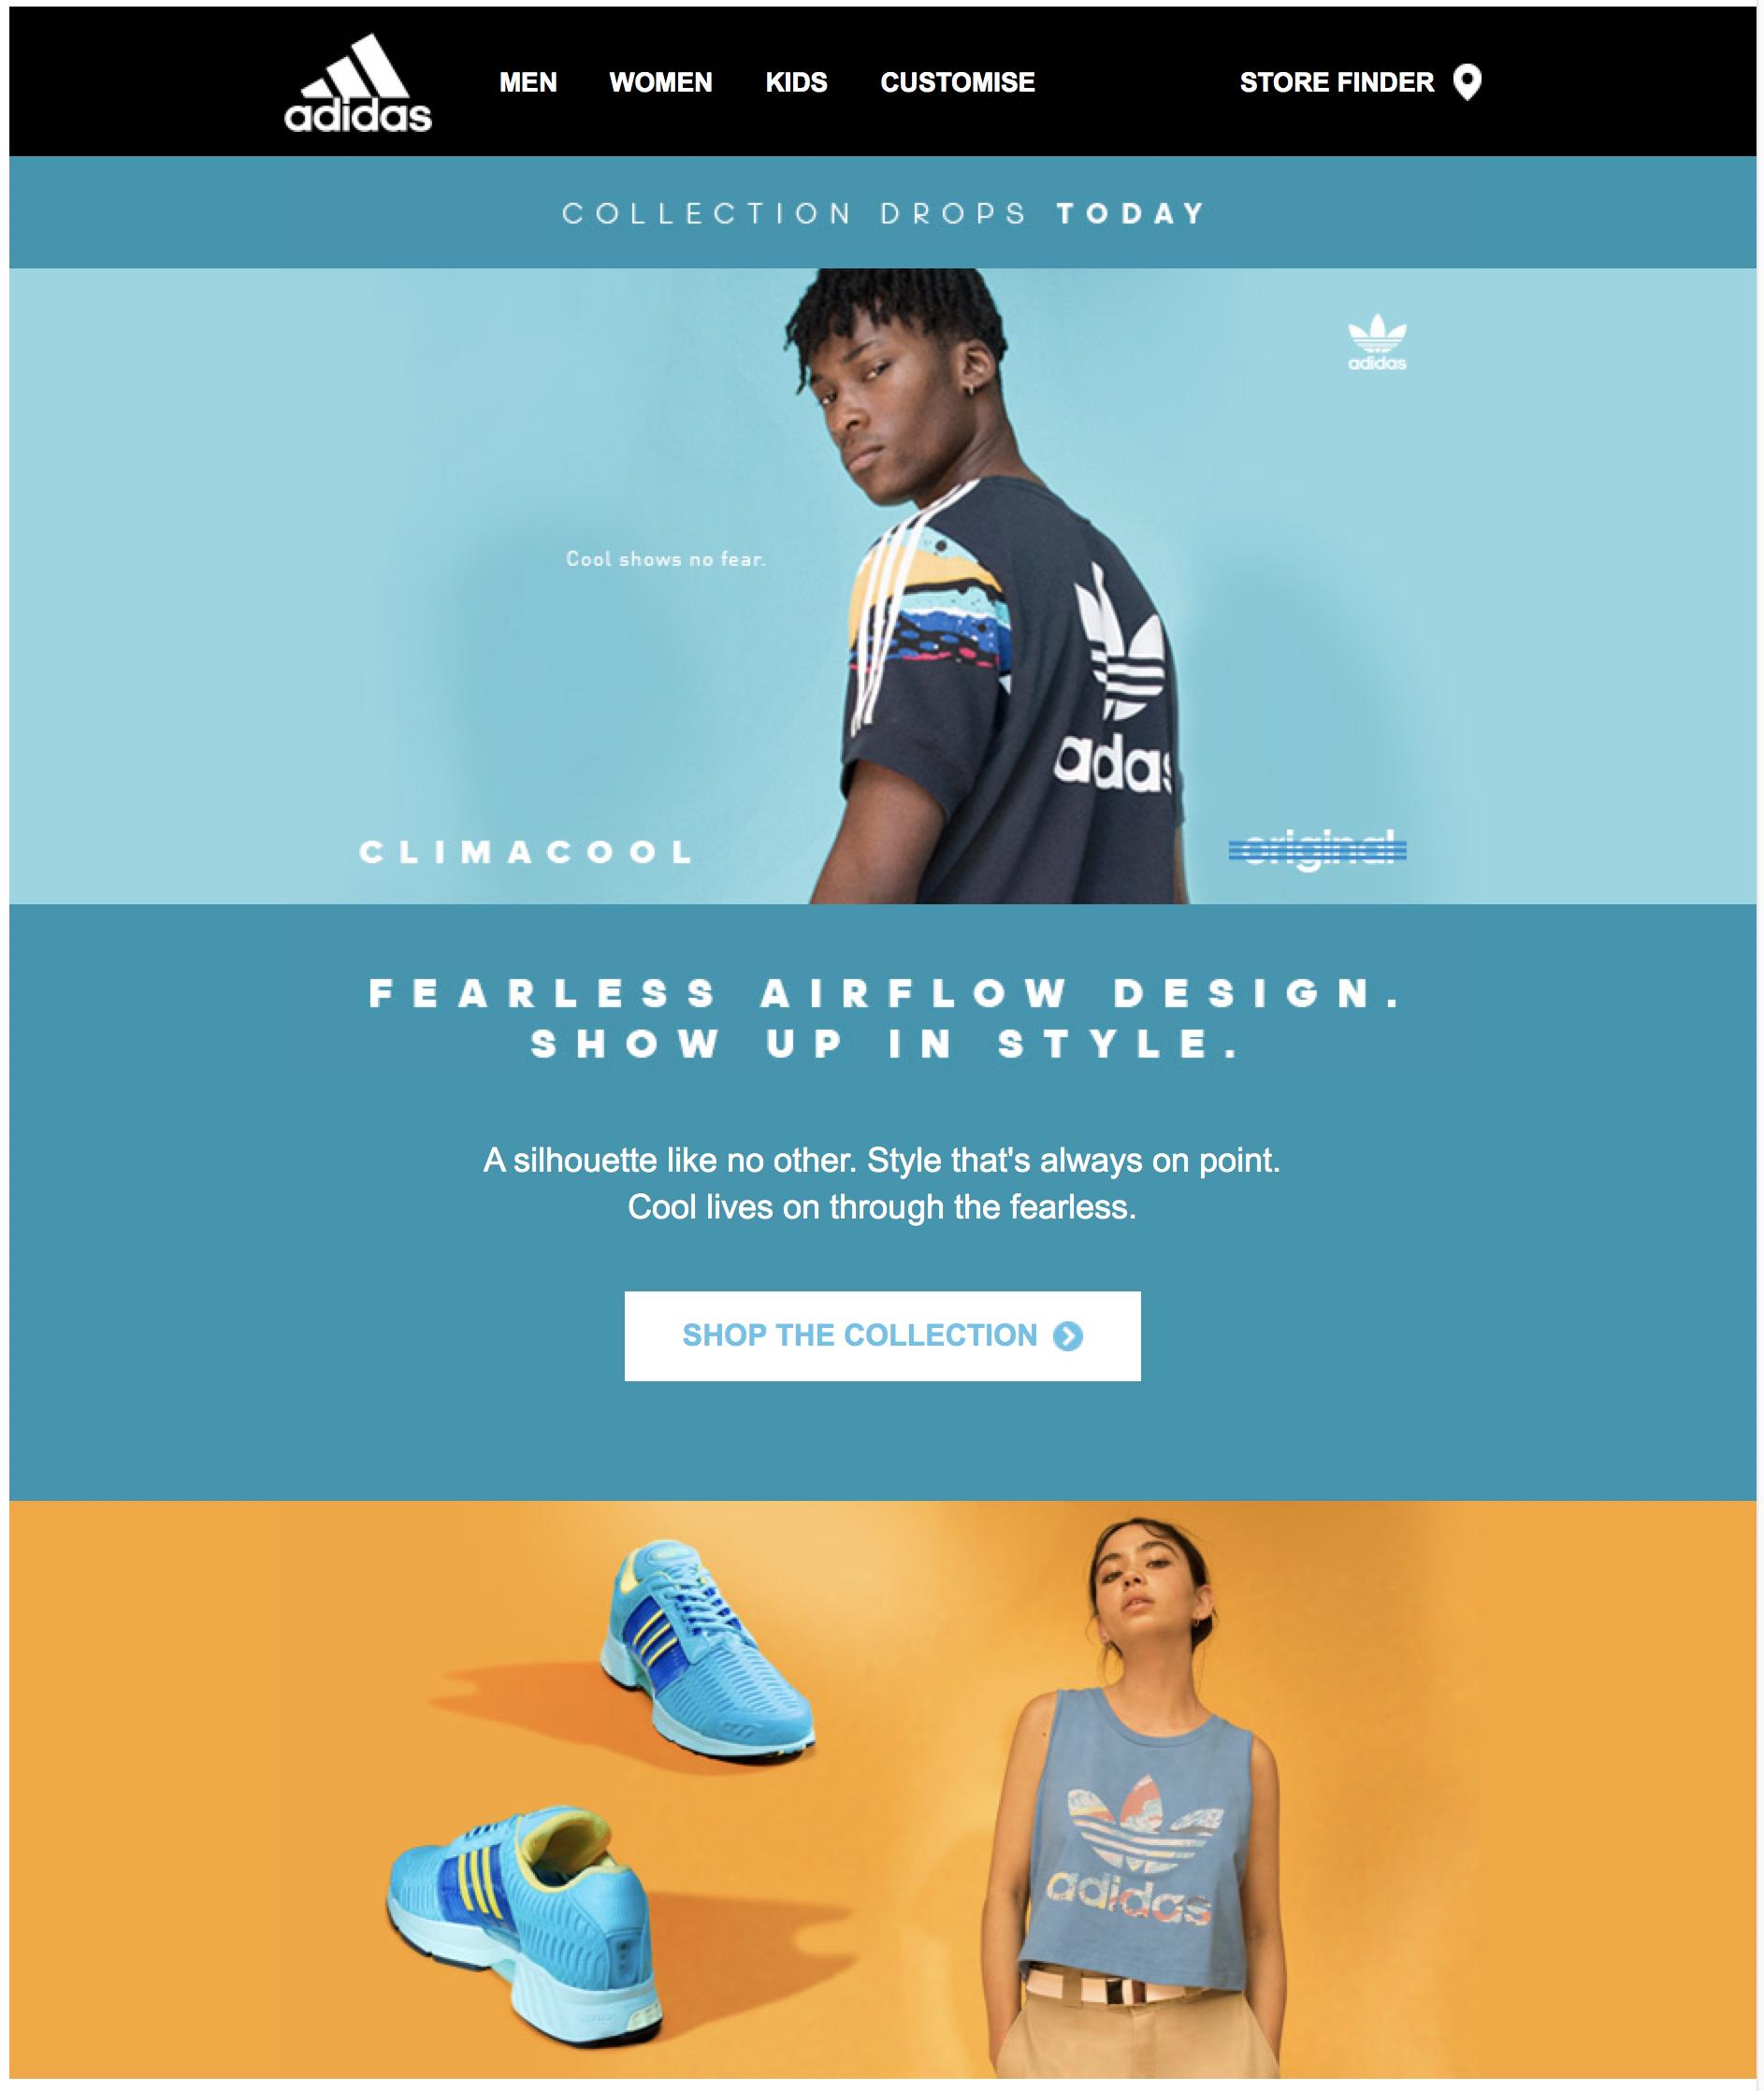 Gemidos Seguir Fraternidad  Adidas newsletter - Climacool   Cores